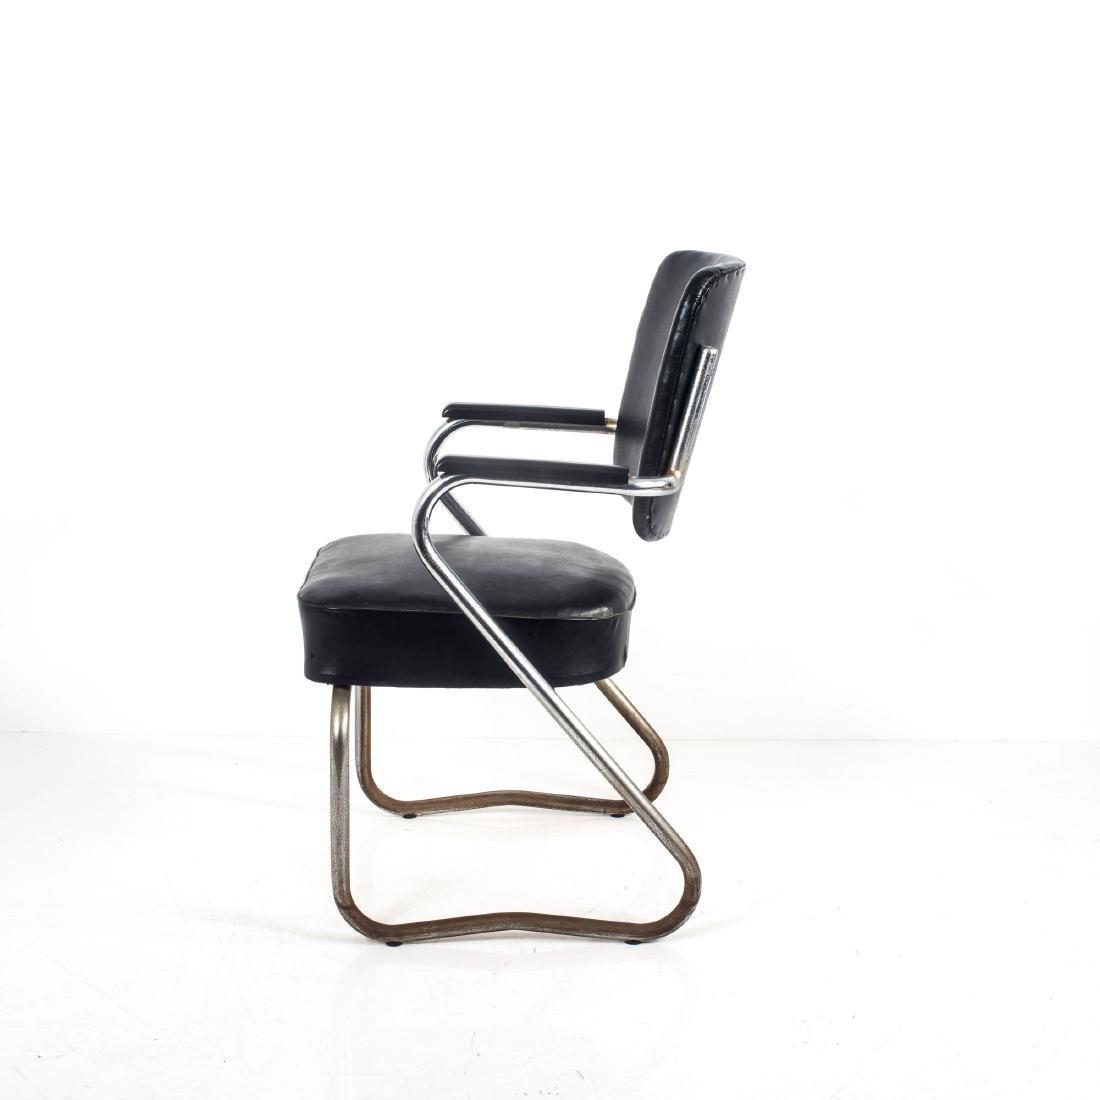 Tubular steel chair, c. 1935 - 2